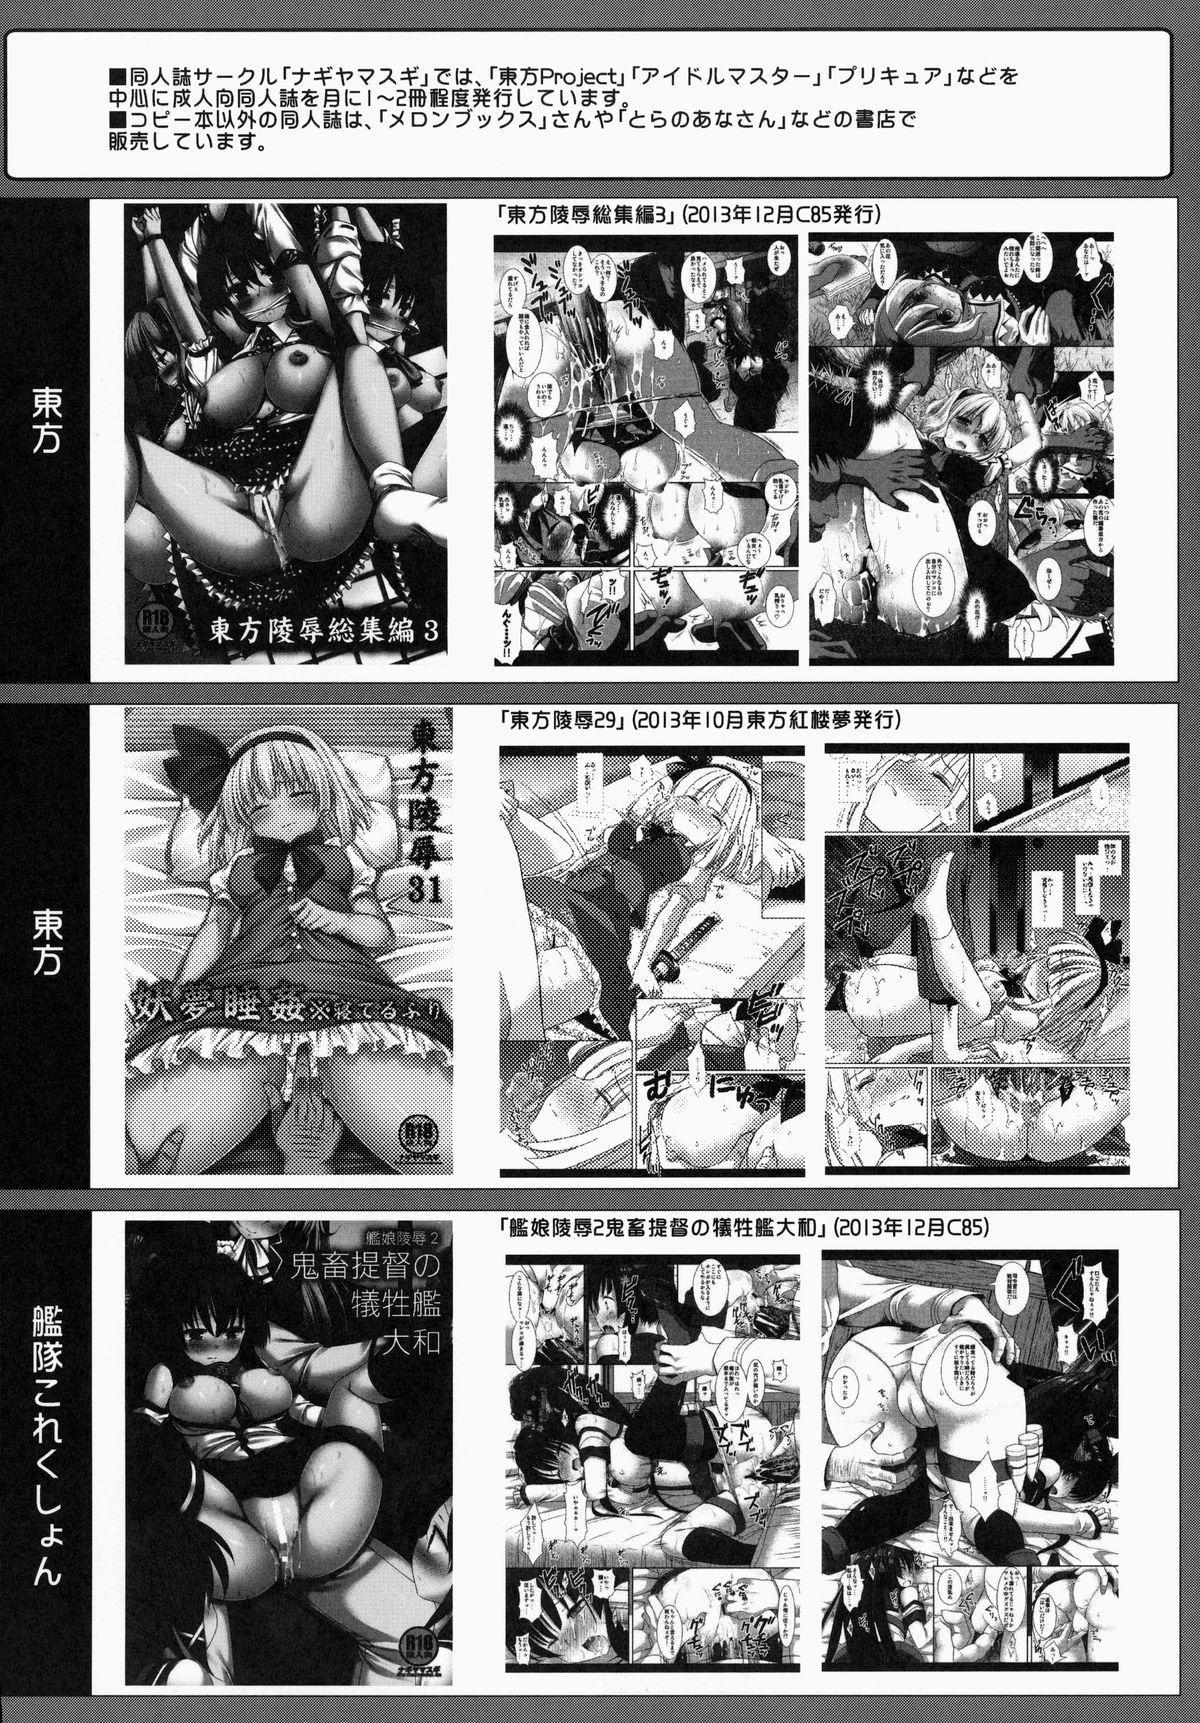 (SC64) [Nagiyamasugi (Nagiyama)] Love Live! Kotori-chan no KadoOna   Kotori-chan's Desk Edge Masturbation (Love Live!) [English] [h0henD] 10